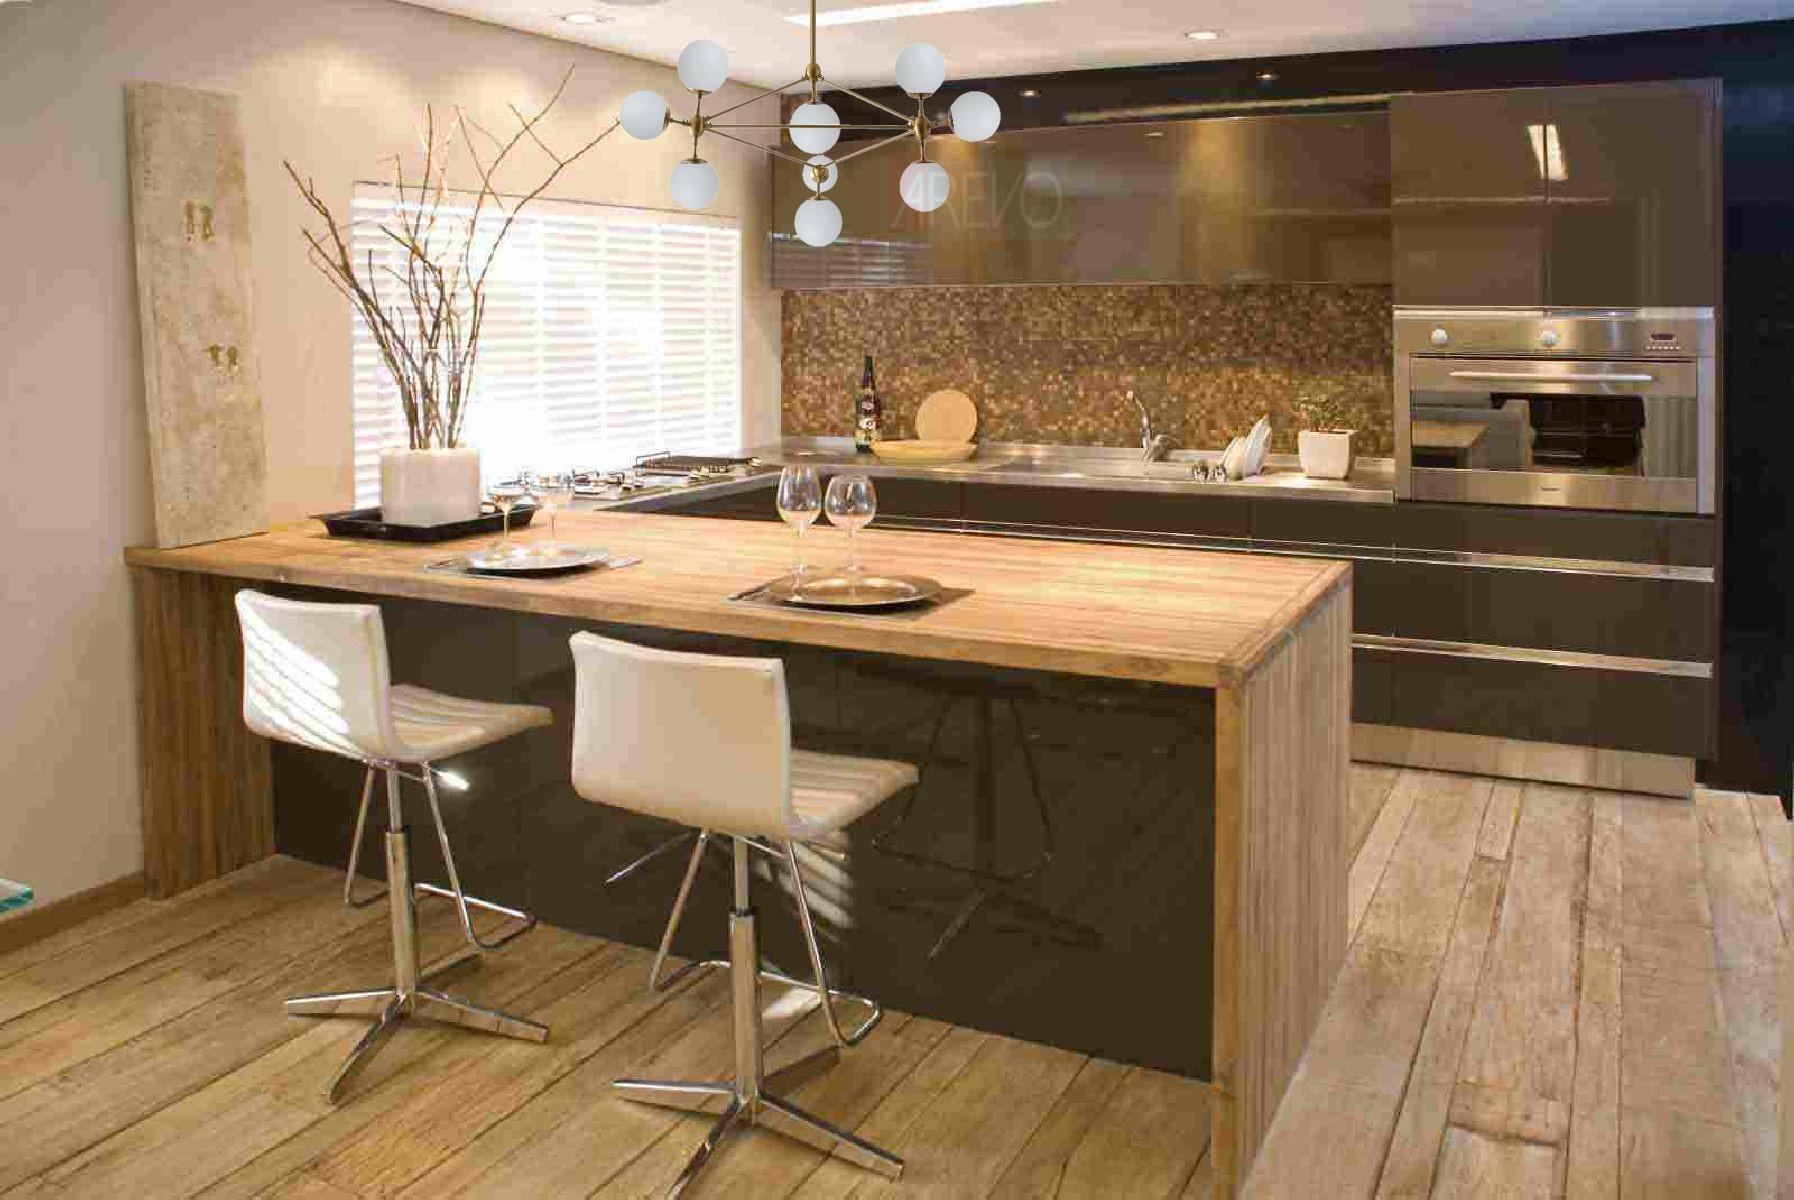 Pendente Jabuticaba Moderno Bronze Mesa Sala Cozinha C/ Led